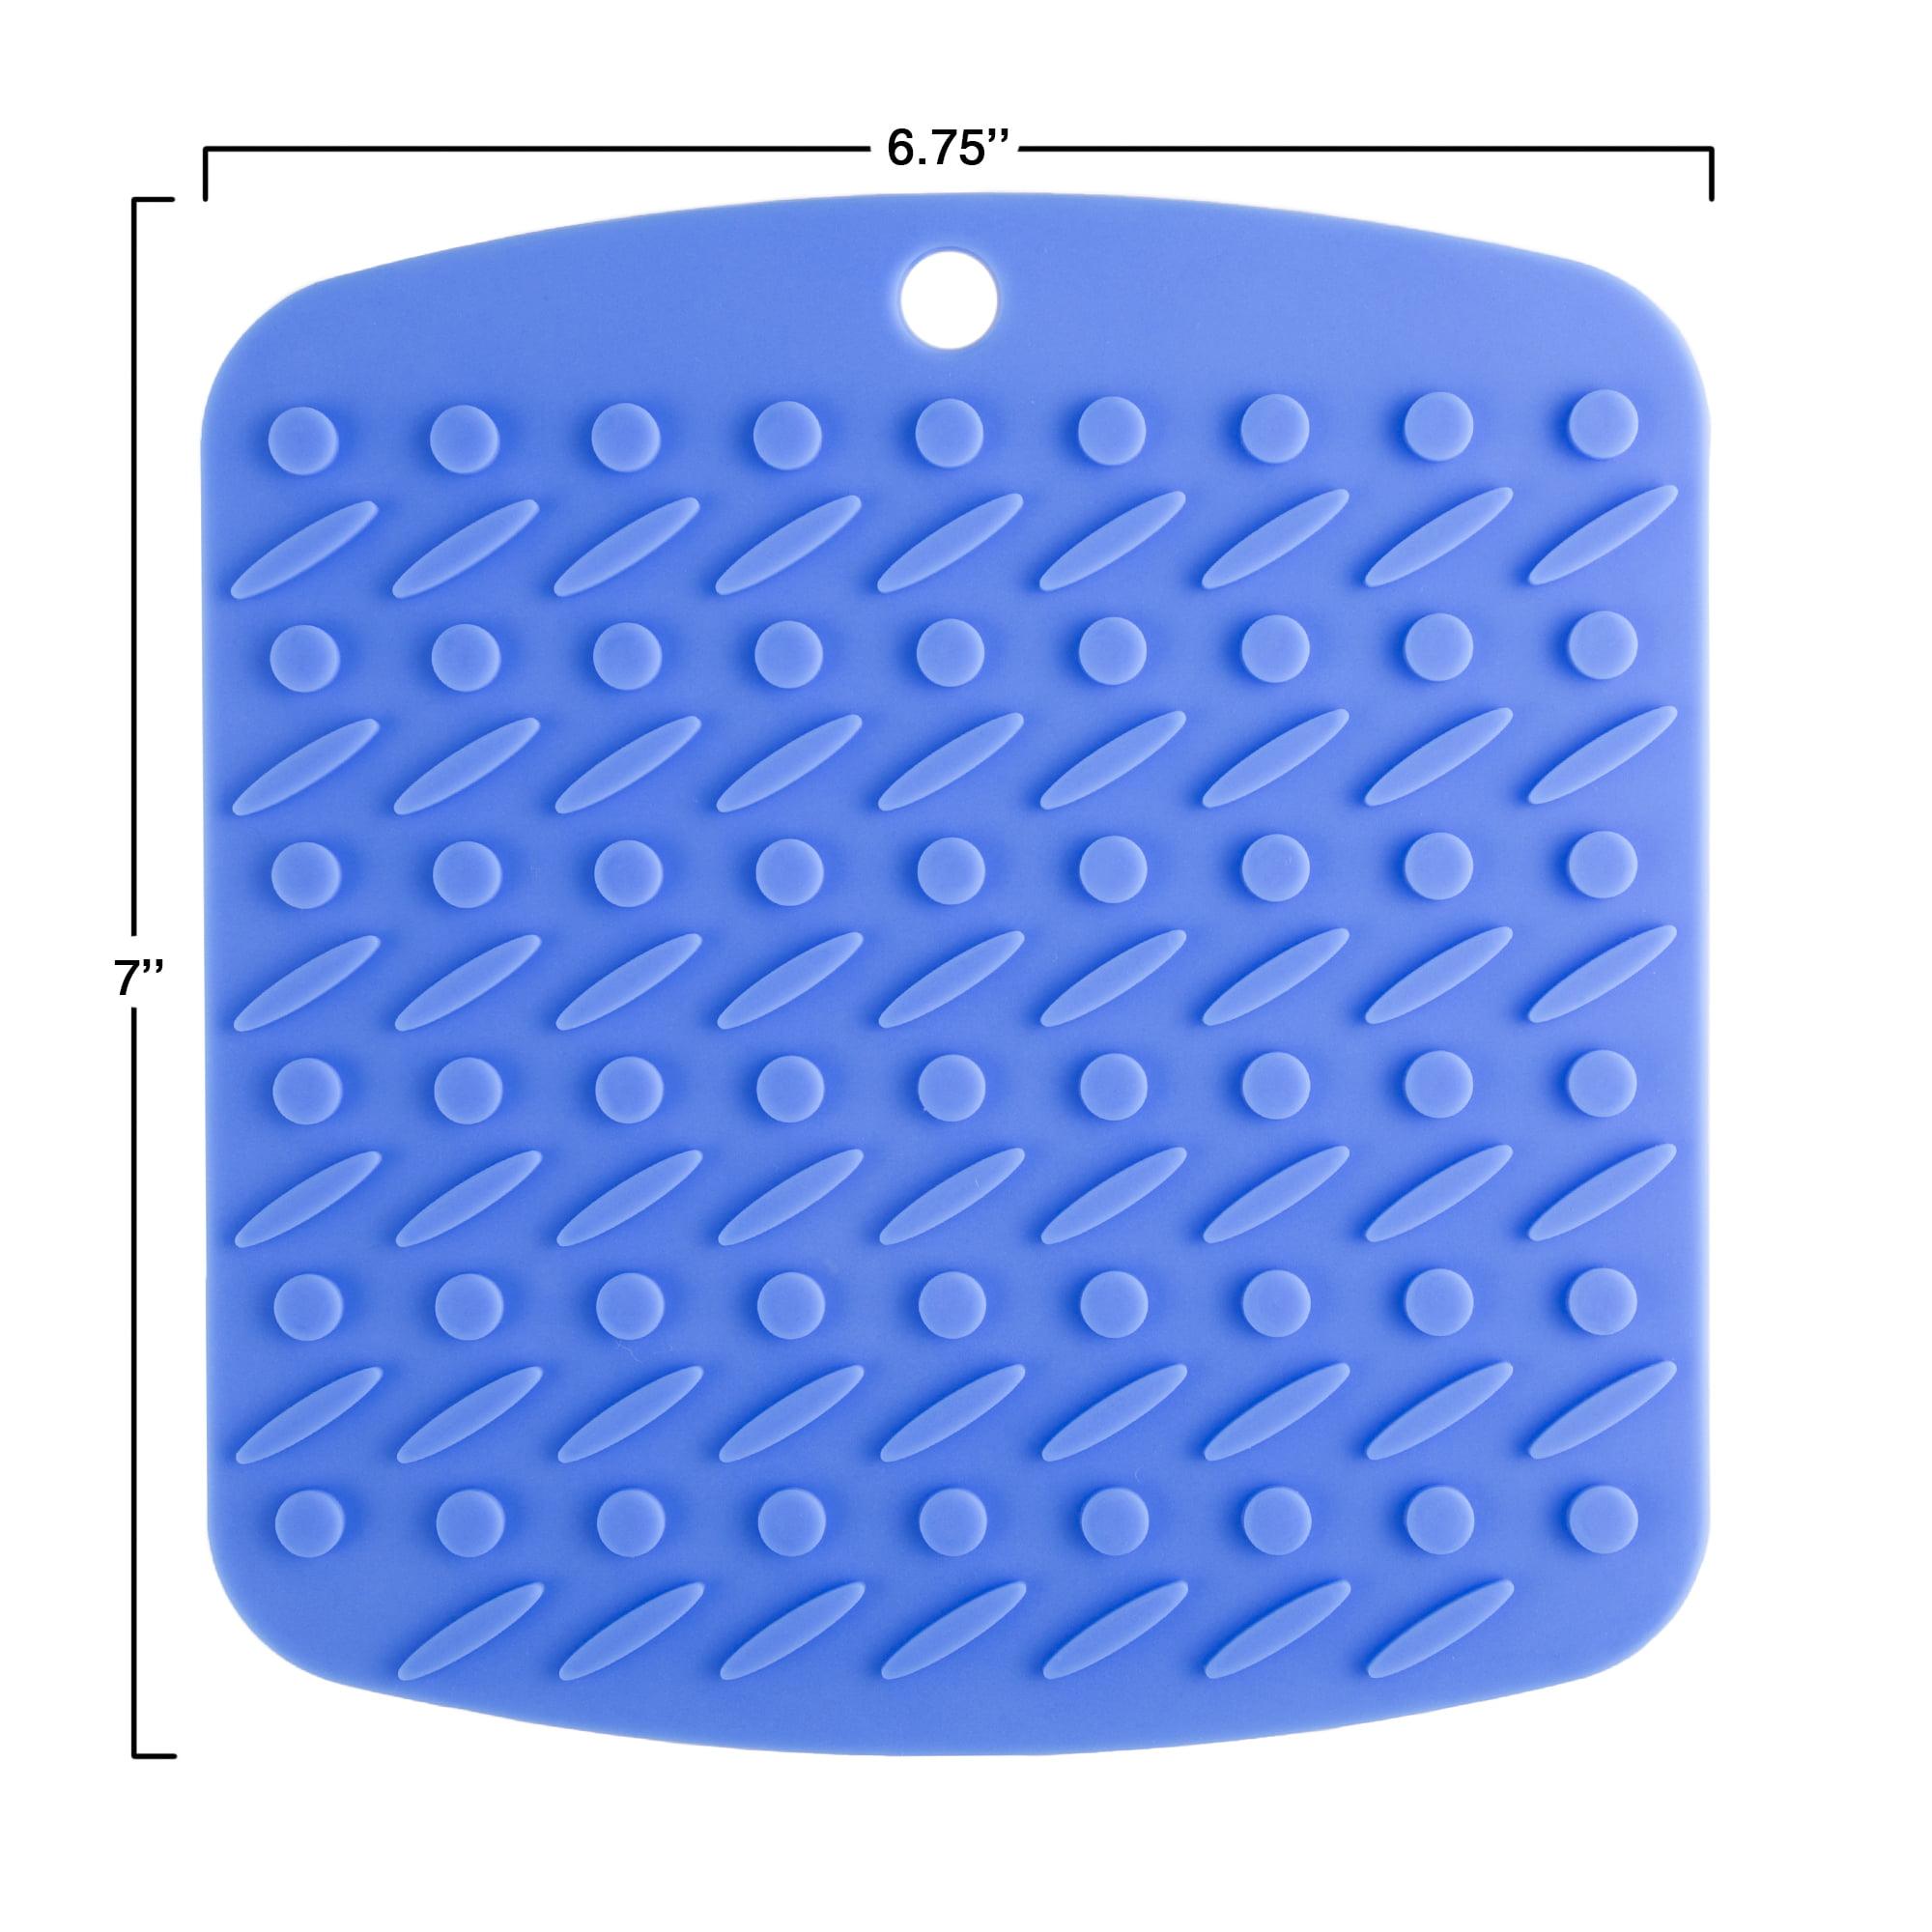 Durable ME.FAN 4 Set Silicone Pot Holders Jar Opener Spoon Rest and Kitchen Trivet Non Slip Flexible Heat Resistant Dishwasher Safe Kitchen Trivet and Pot Pads -Purple Trivet Mat